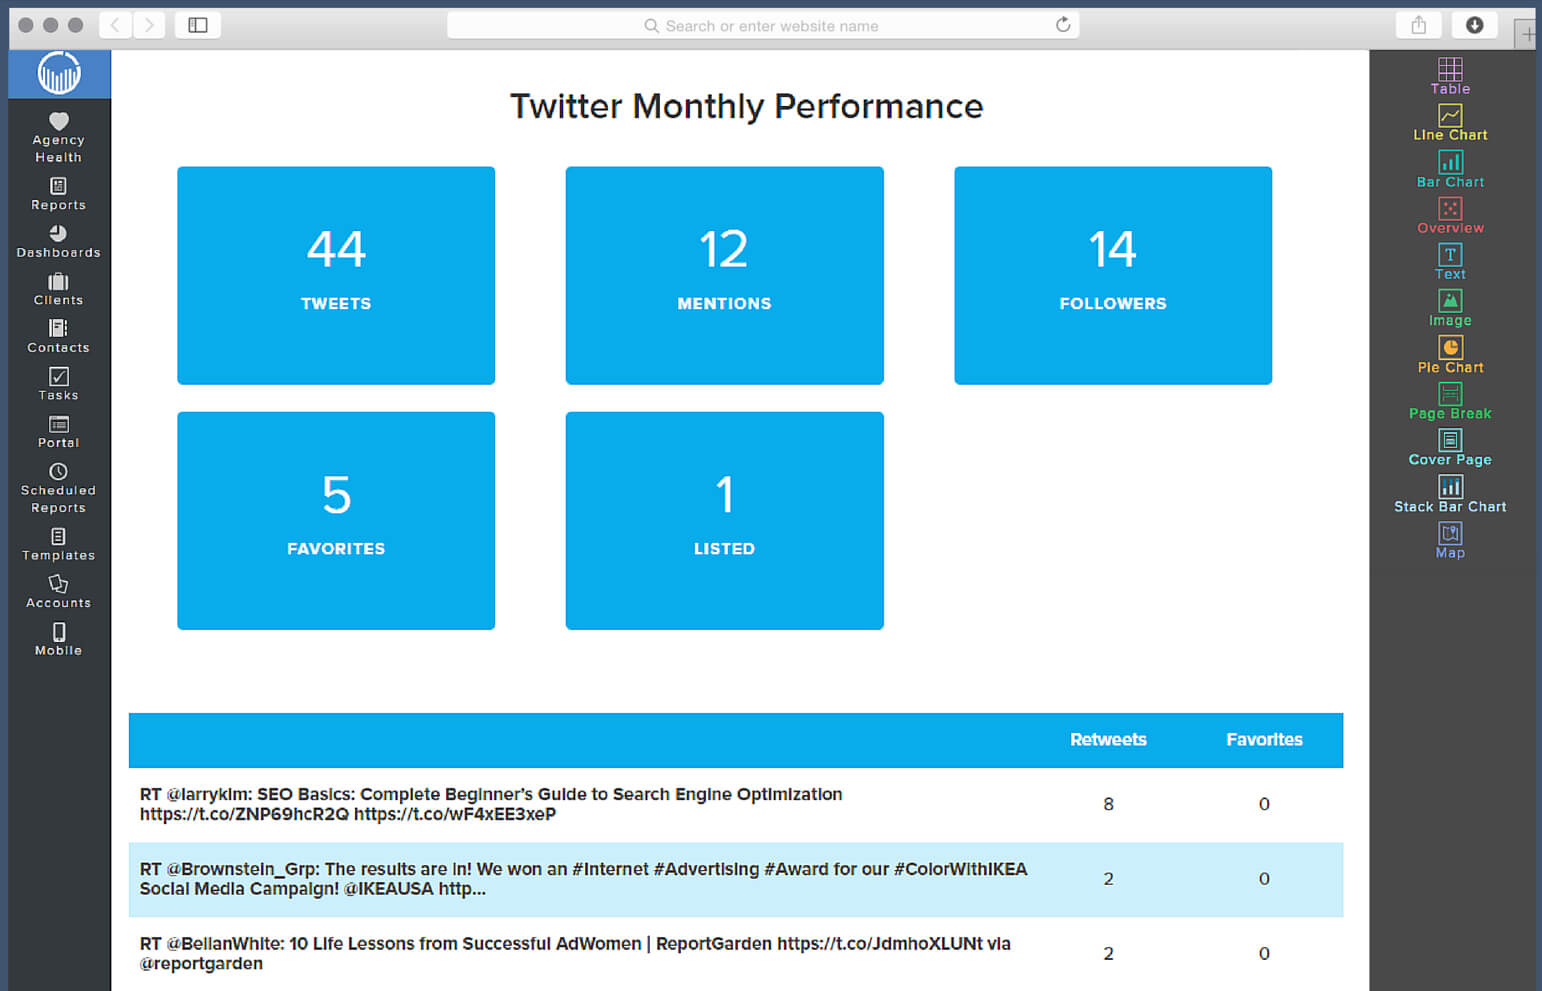 004 Template Ideas Social Media Reporting Templates Report With Regard To Social Media Report Template